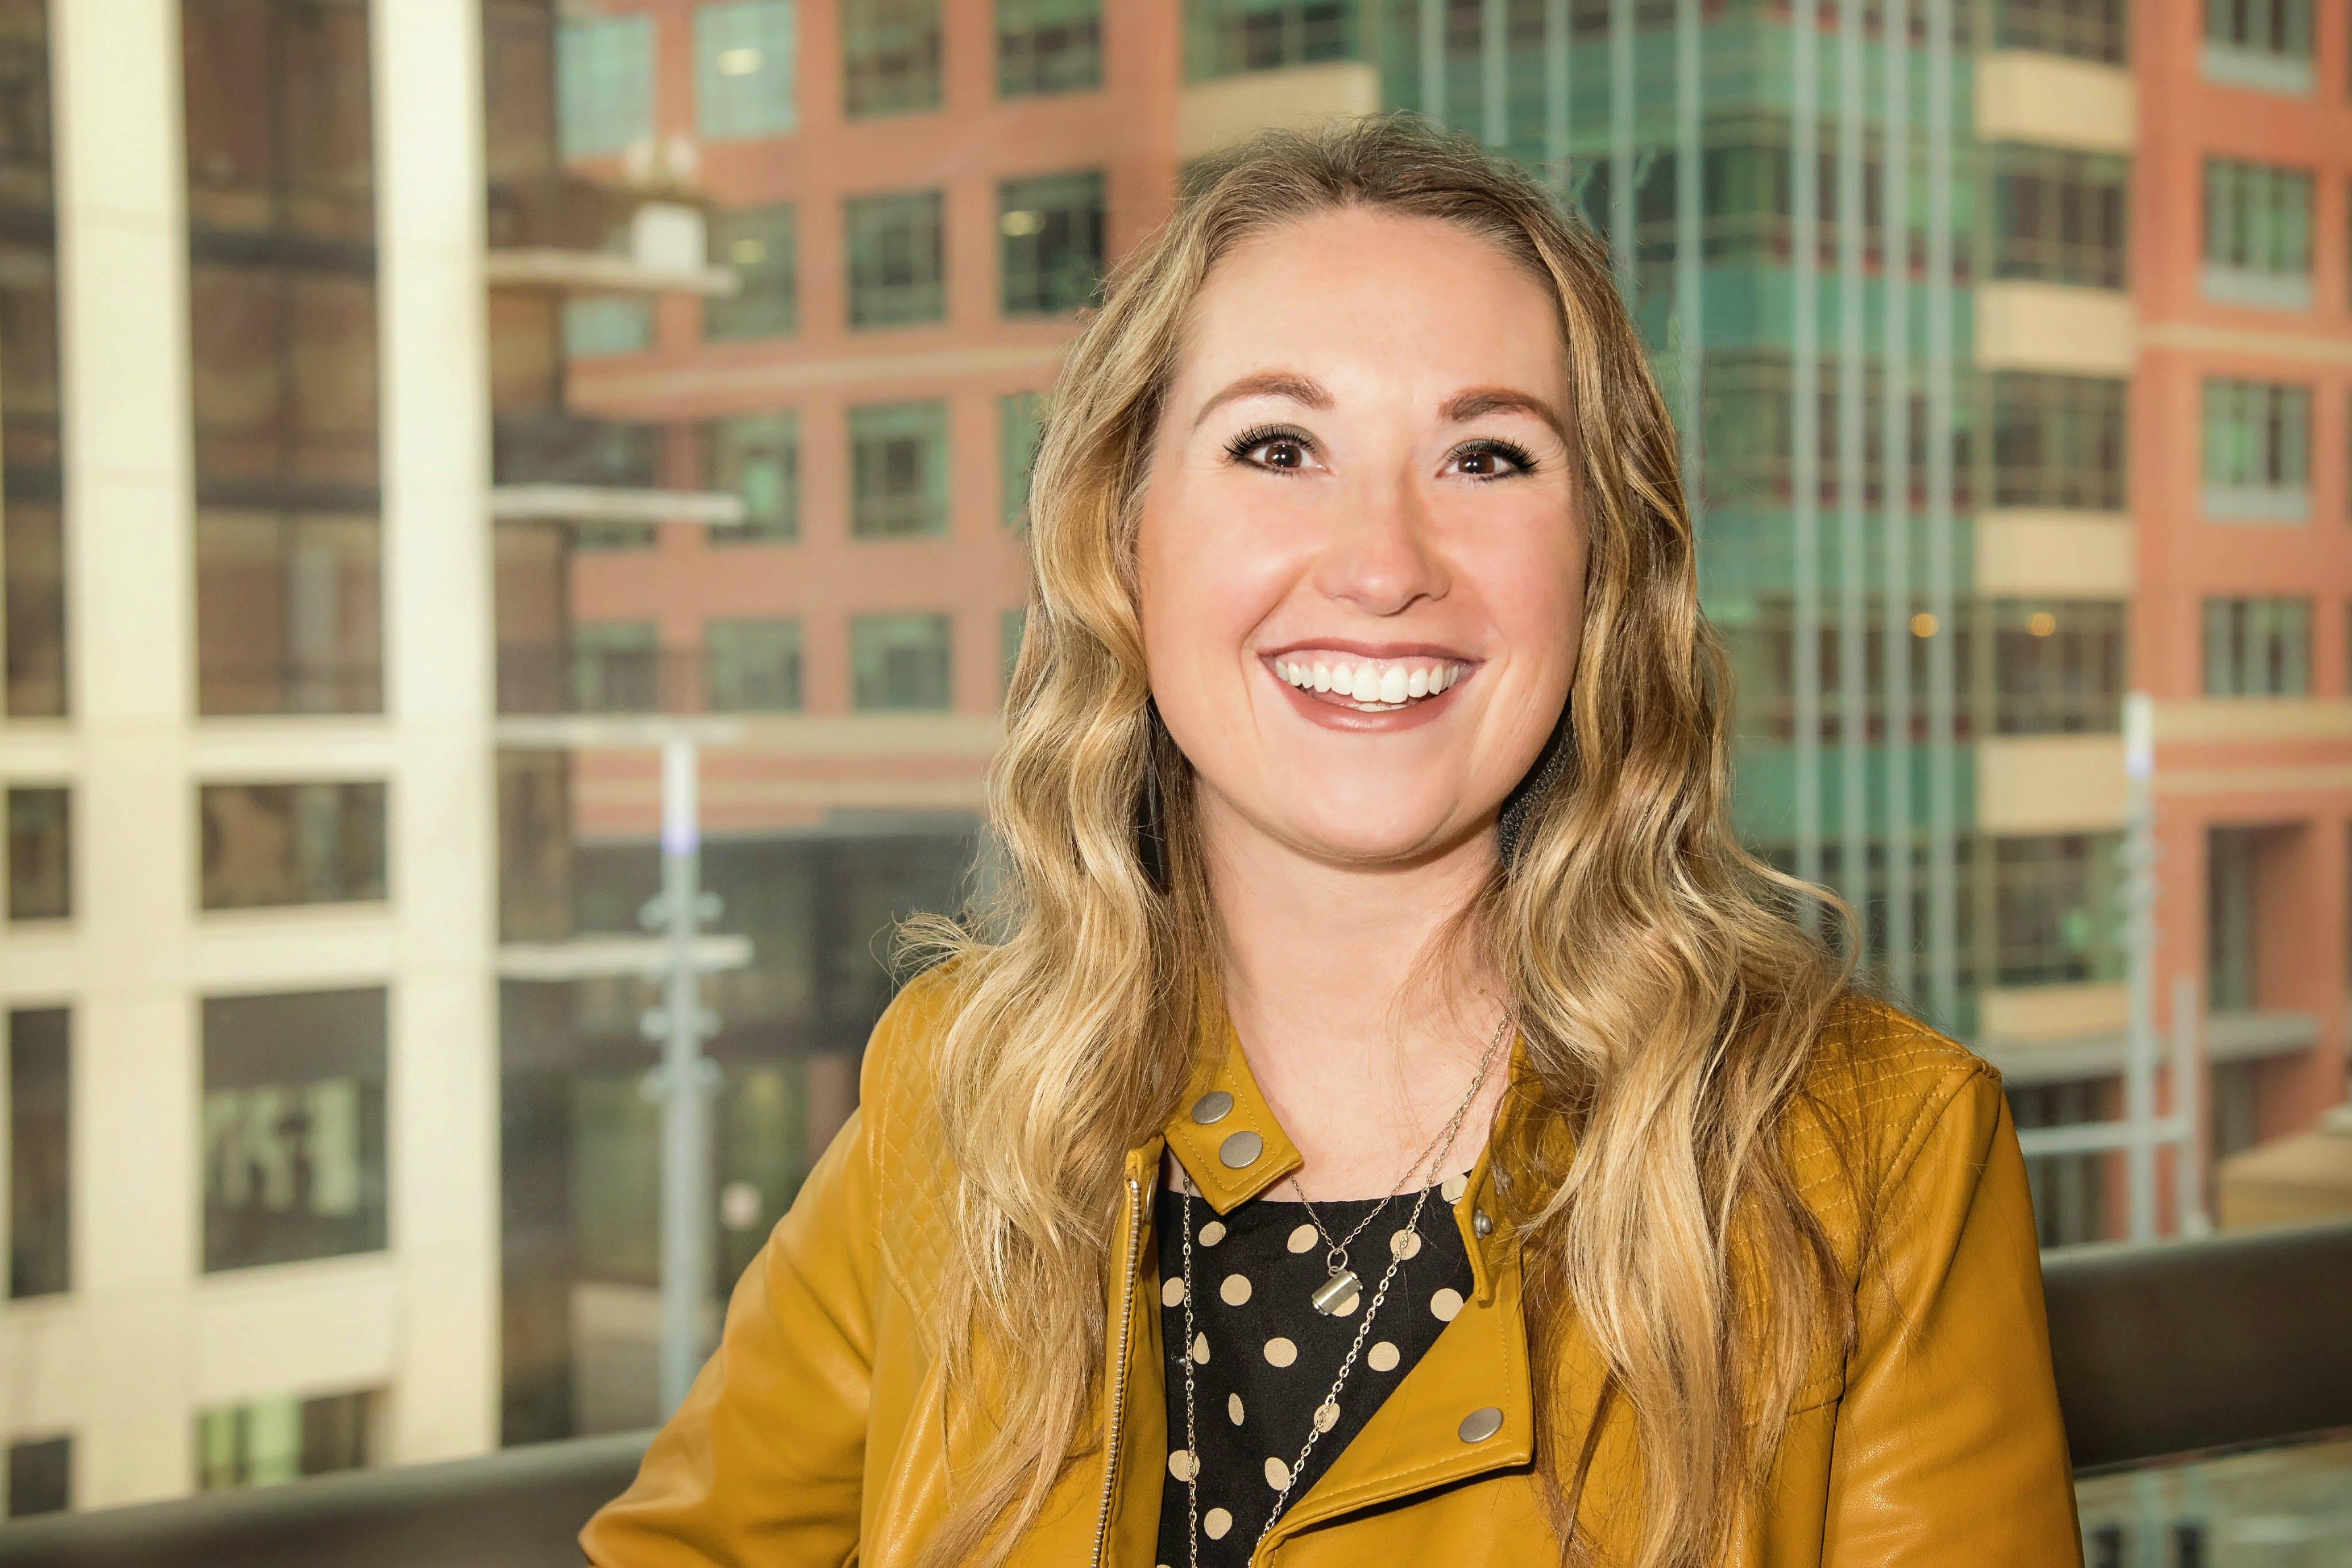 Bethel University alumna Alison Penner Rahn '01